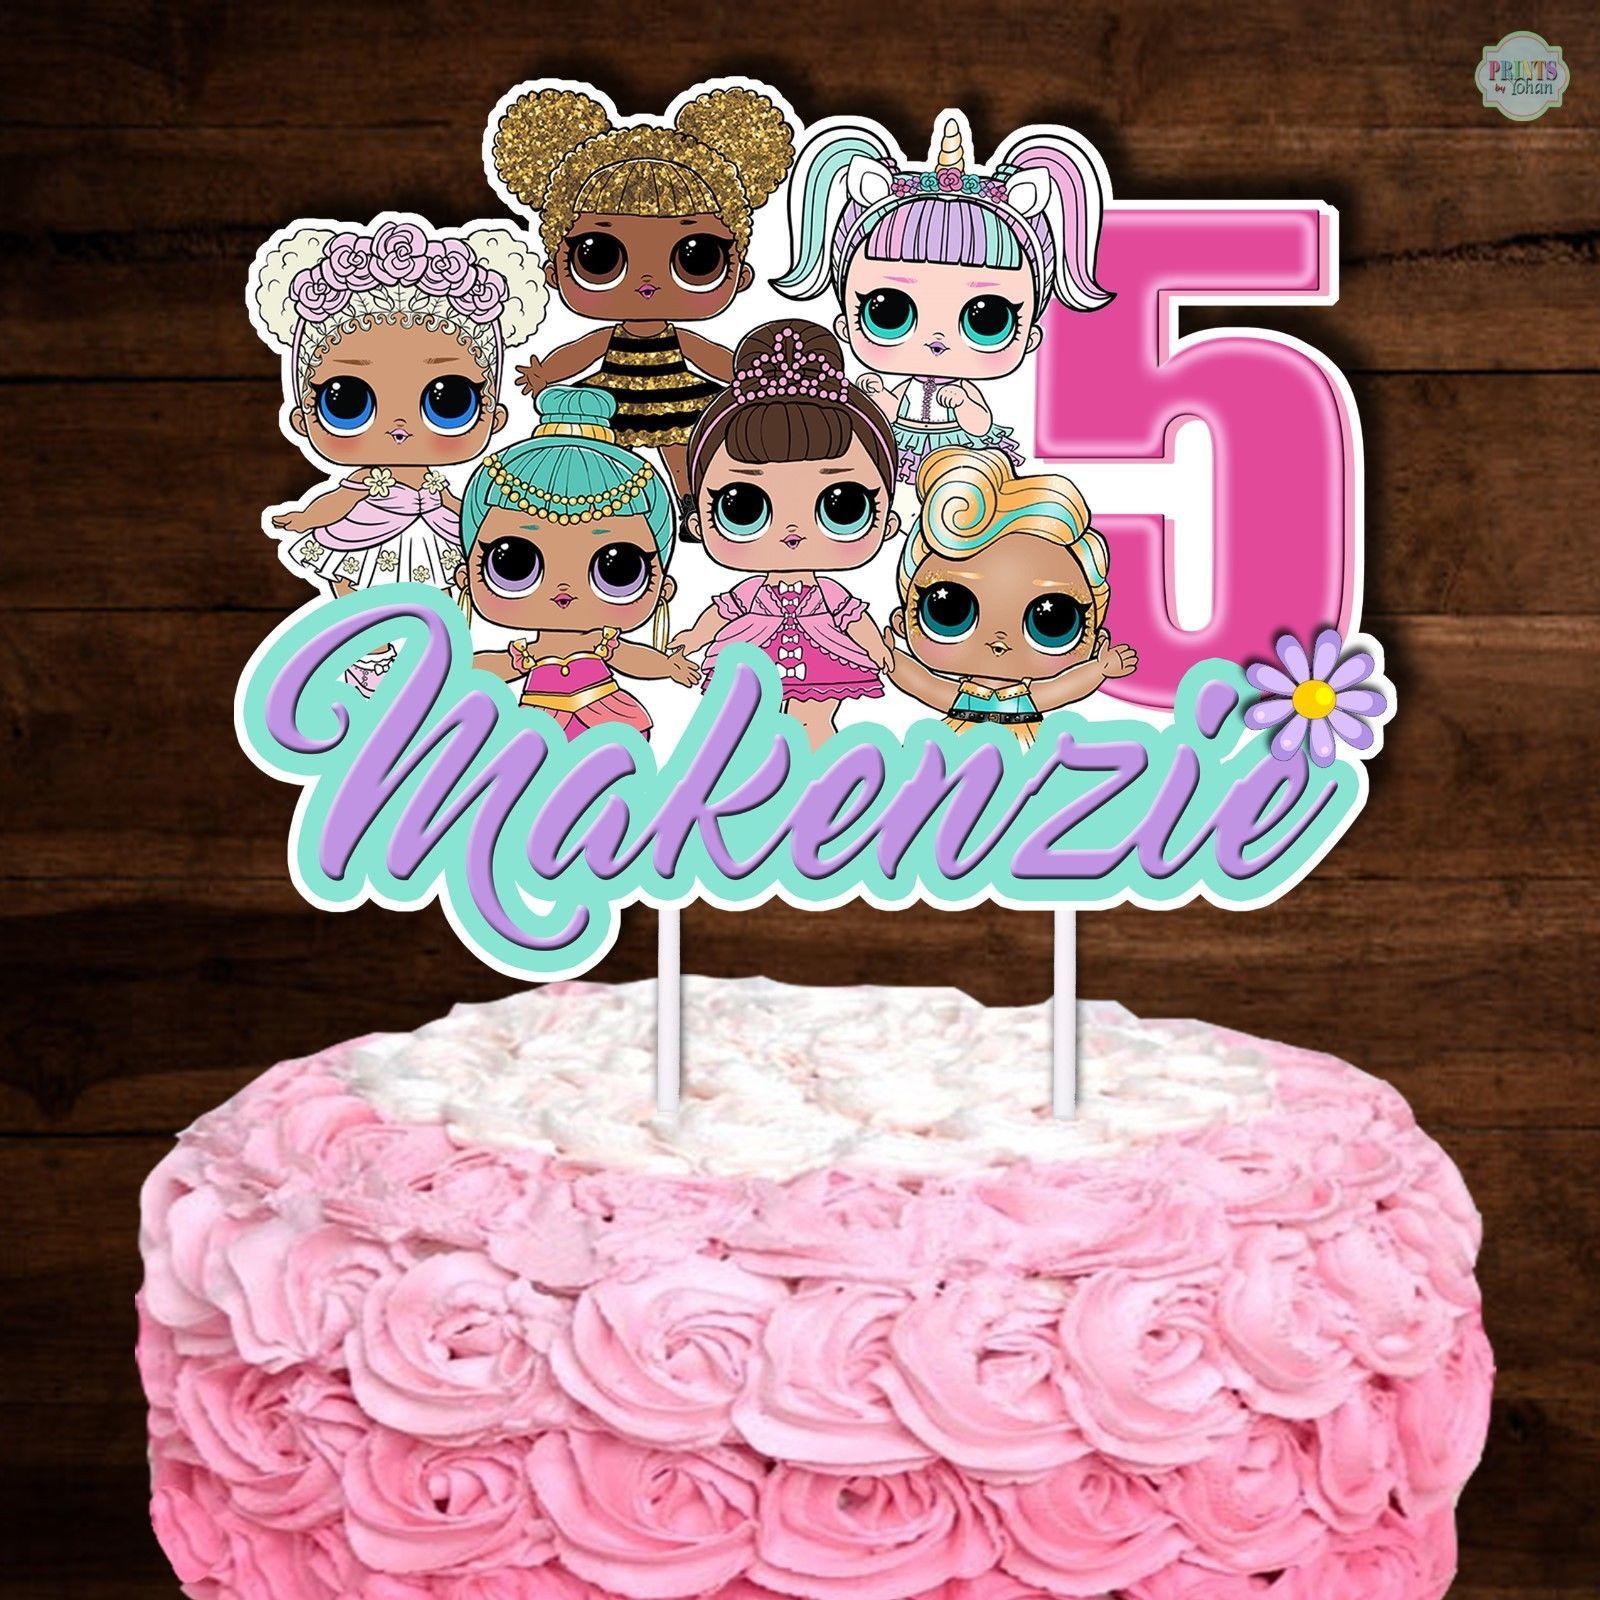 Lol Surprise Dolls Cake Topper Cake Bunting Cake Decorations Cupcake Topper Doll Cake Topper Doll Cake Creative Cake Decorating